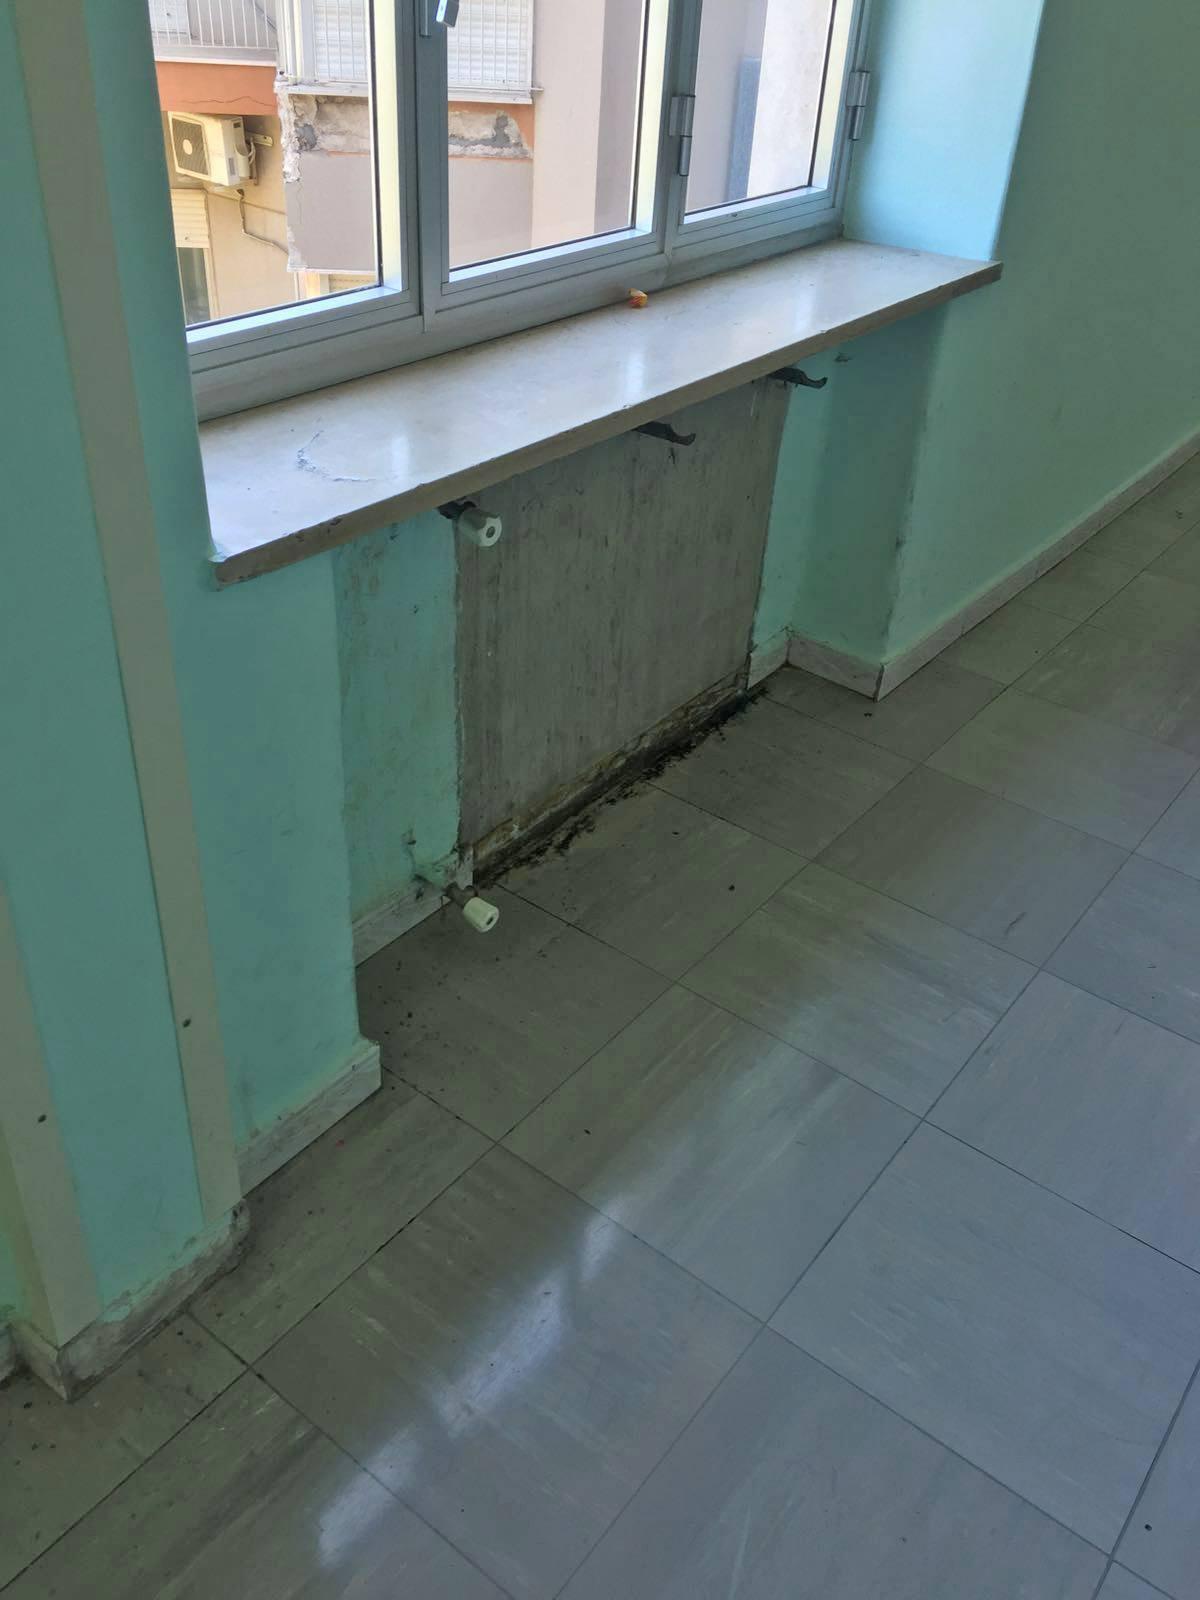 San Leonardo stato di abbandono degrado ospedale castmare